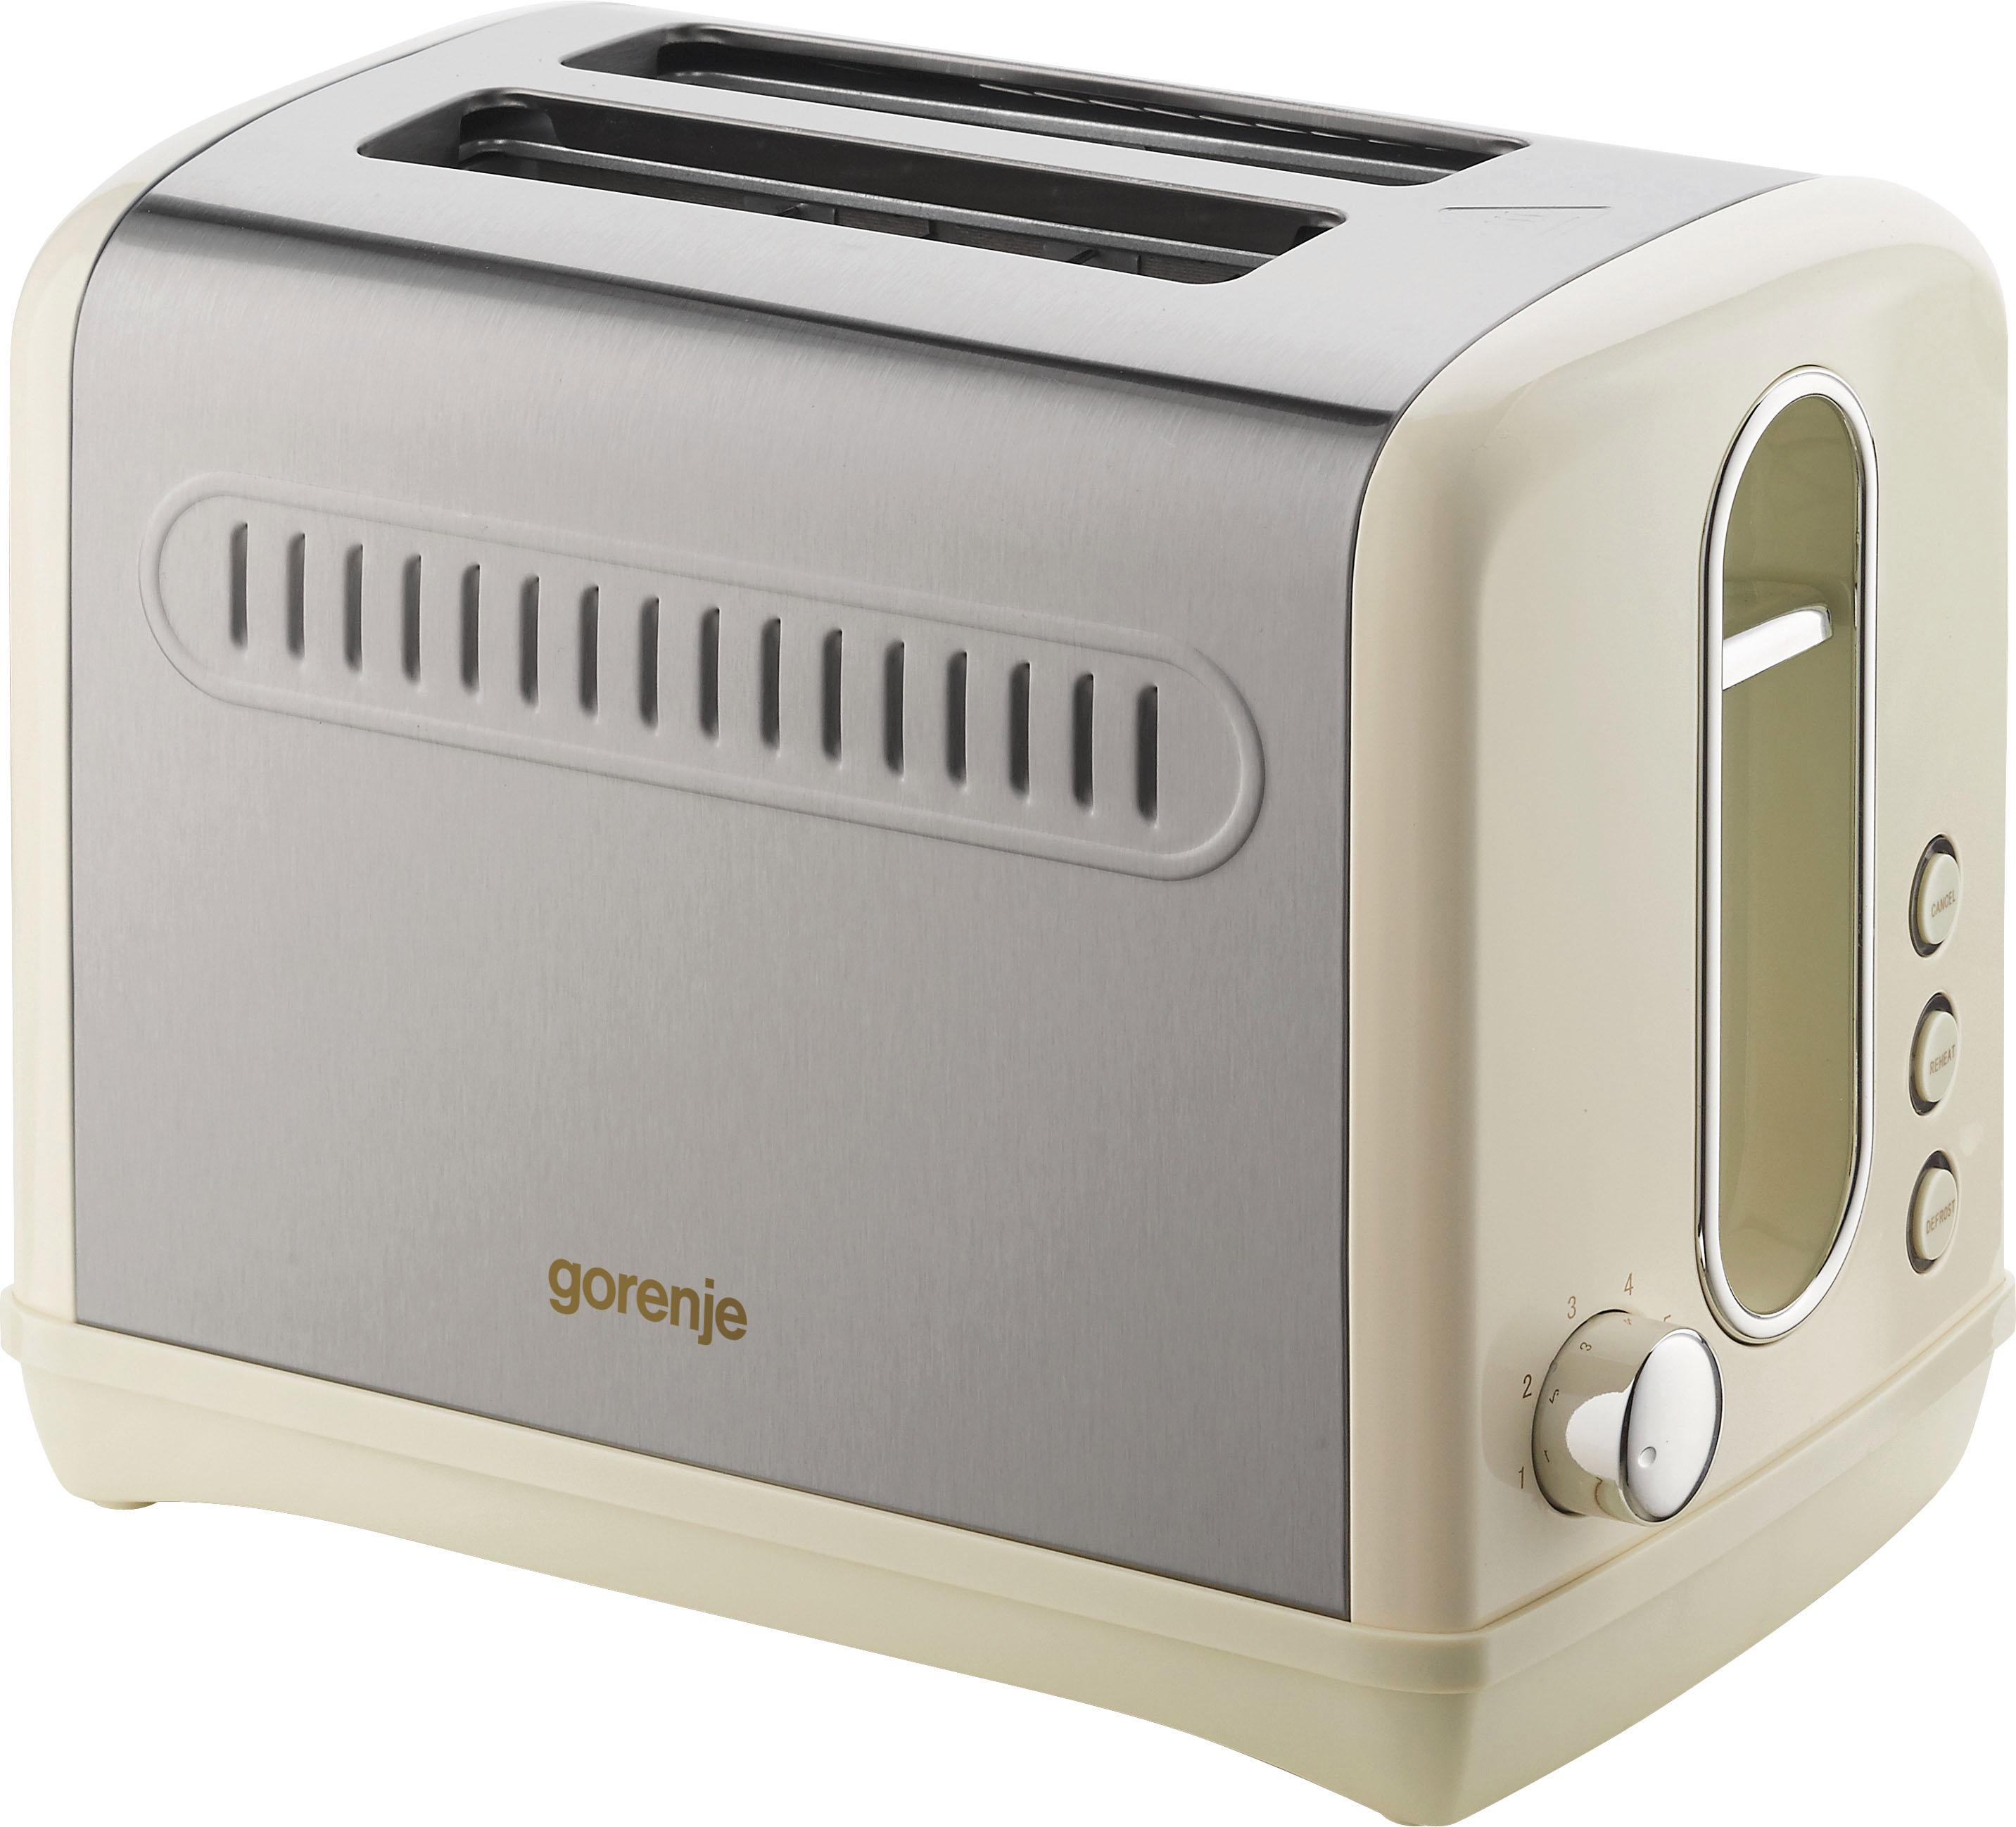 gorenje toaster t1100cli aus der classico edition 950. Black Bedroom Furniture Sets. Home Design Ideas